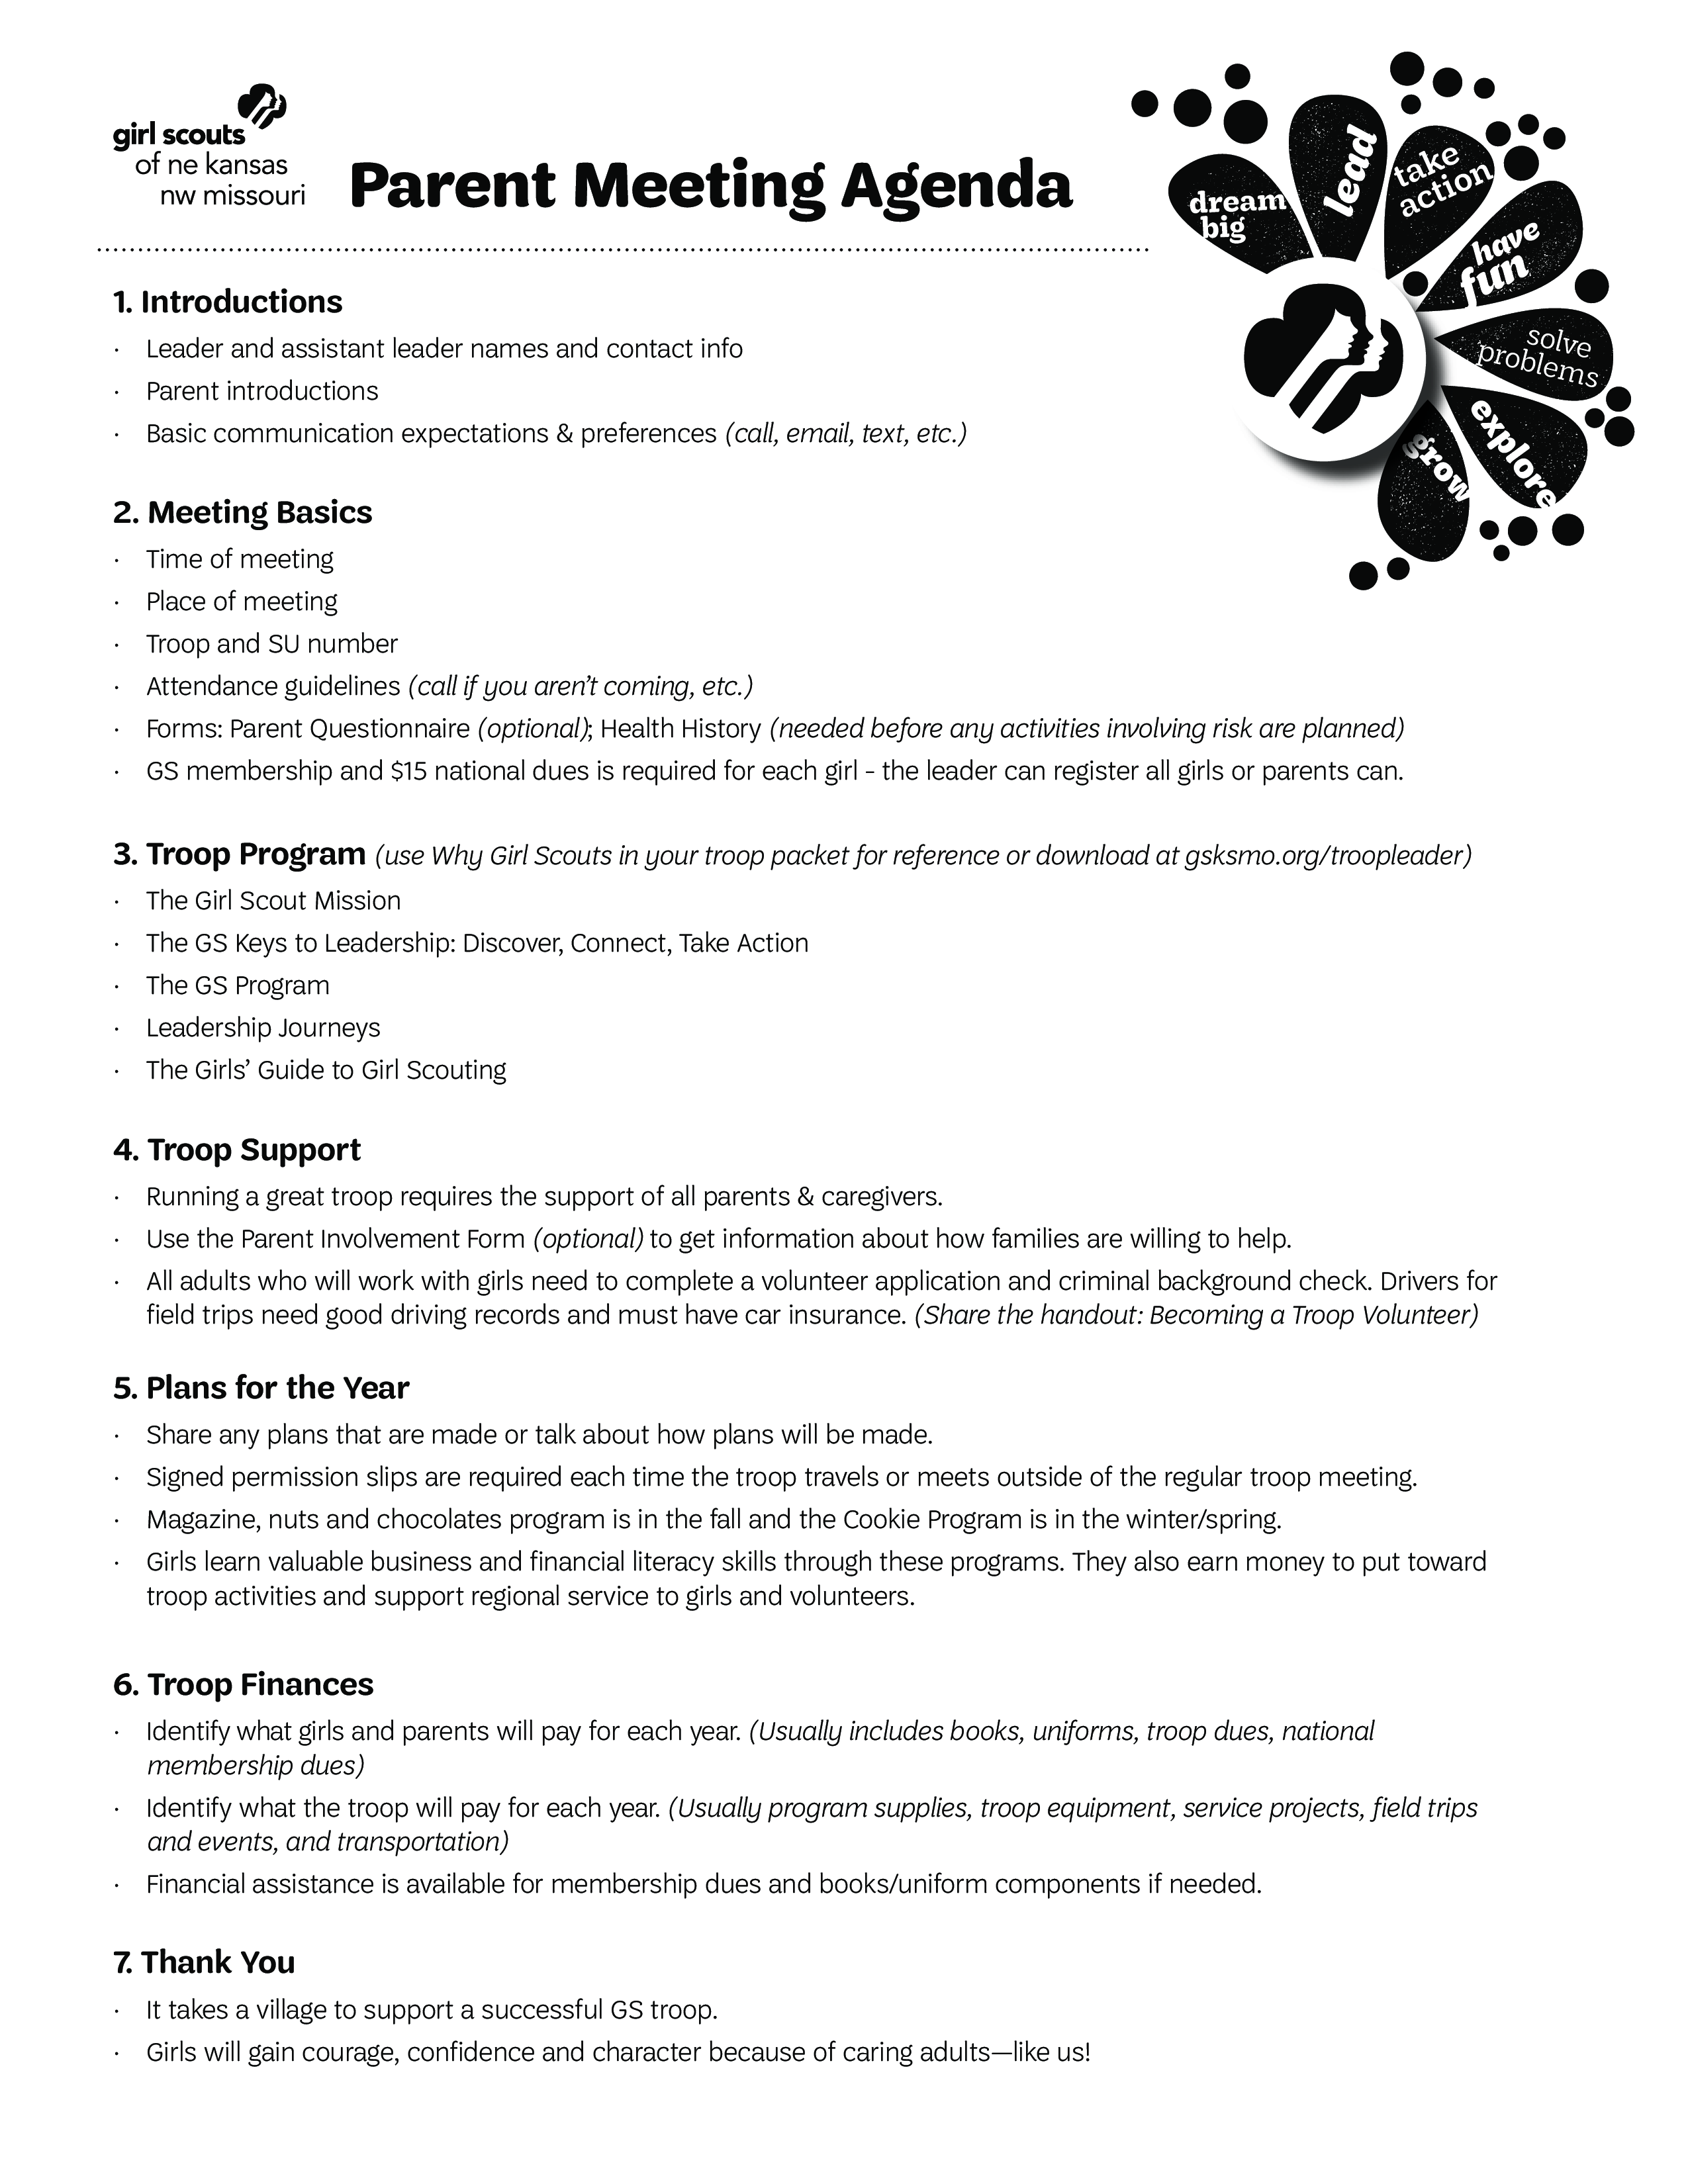 Parent Meeting Agenda Main Image Download Template